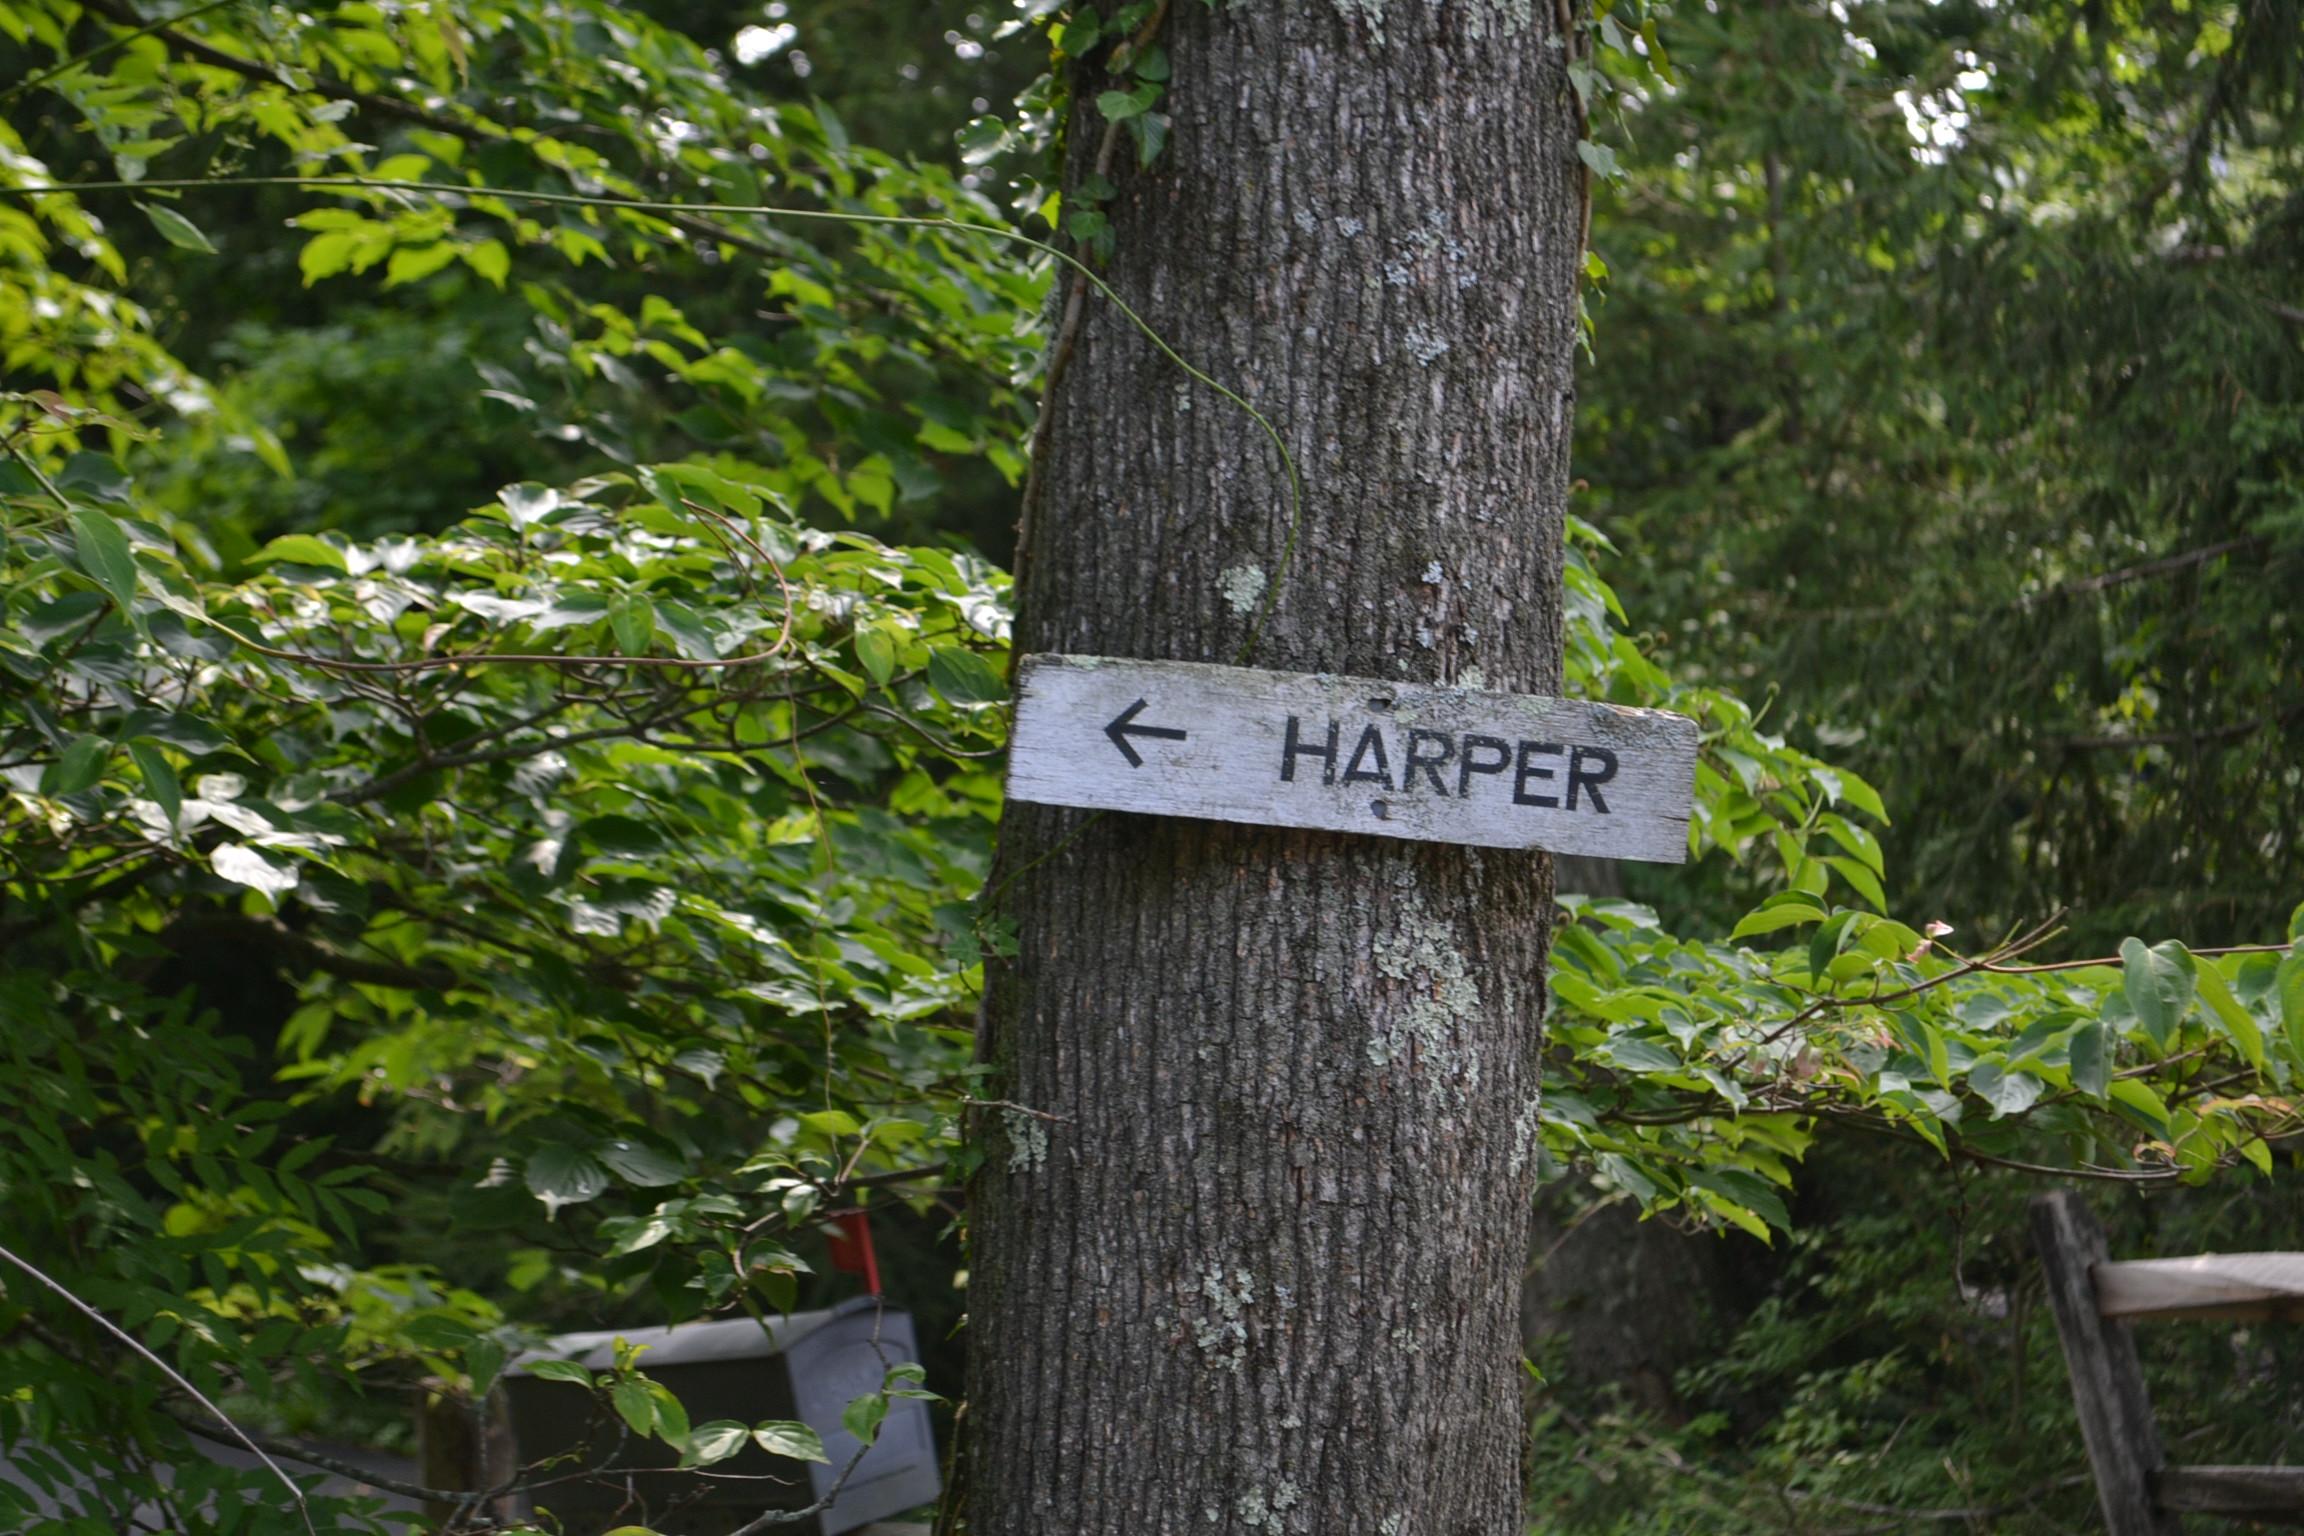 Harper Sign on Tree.JPG